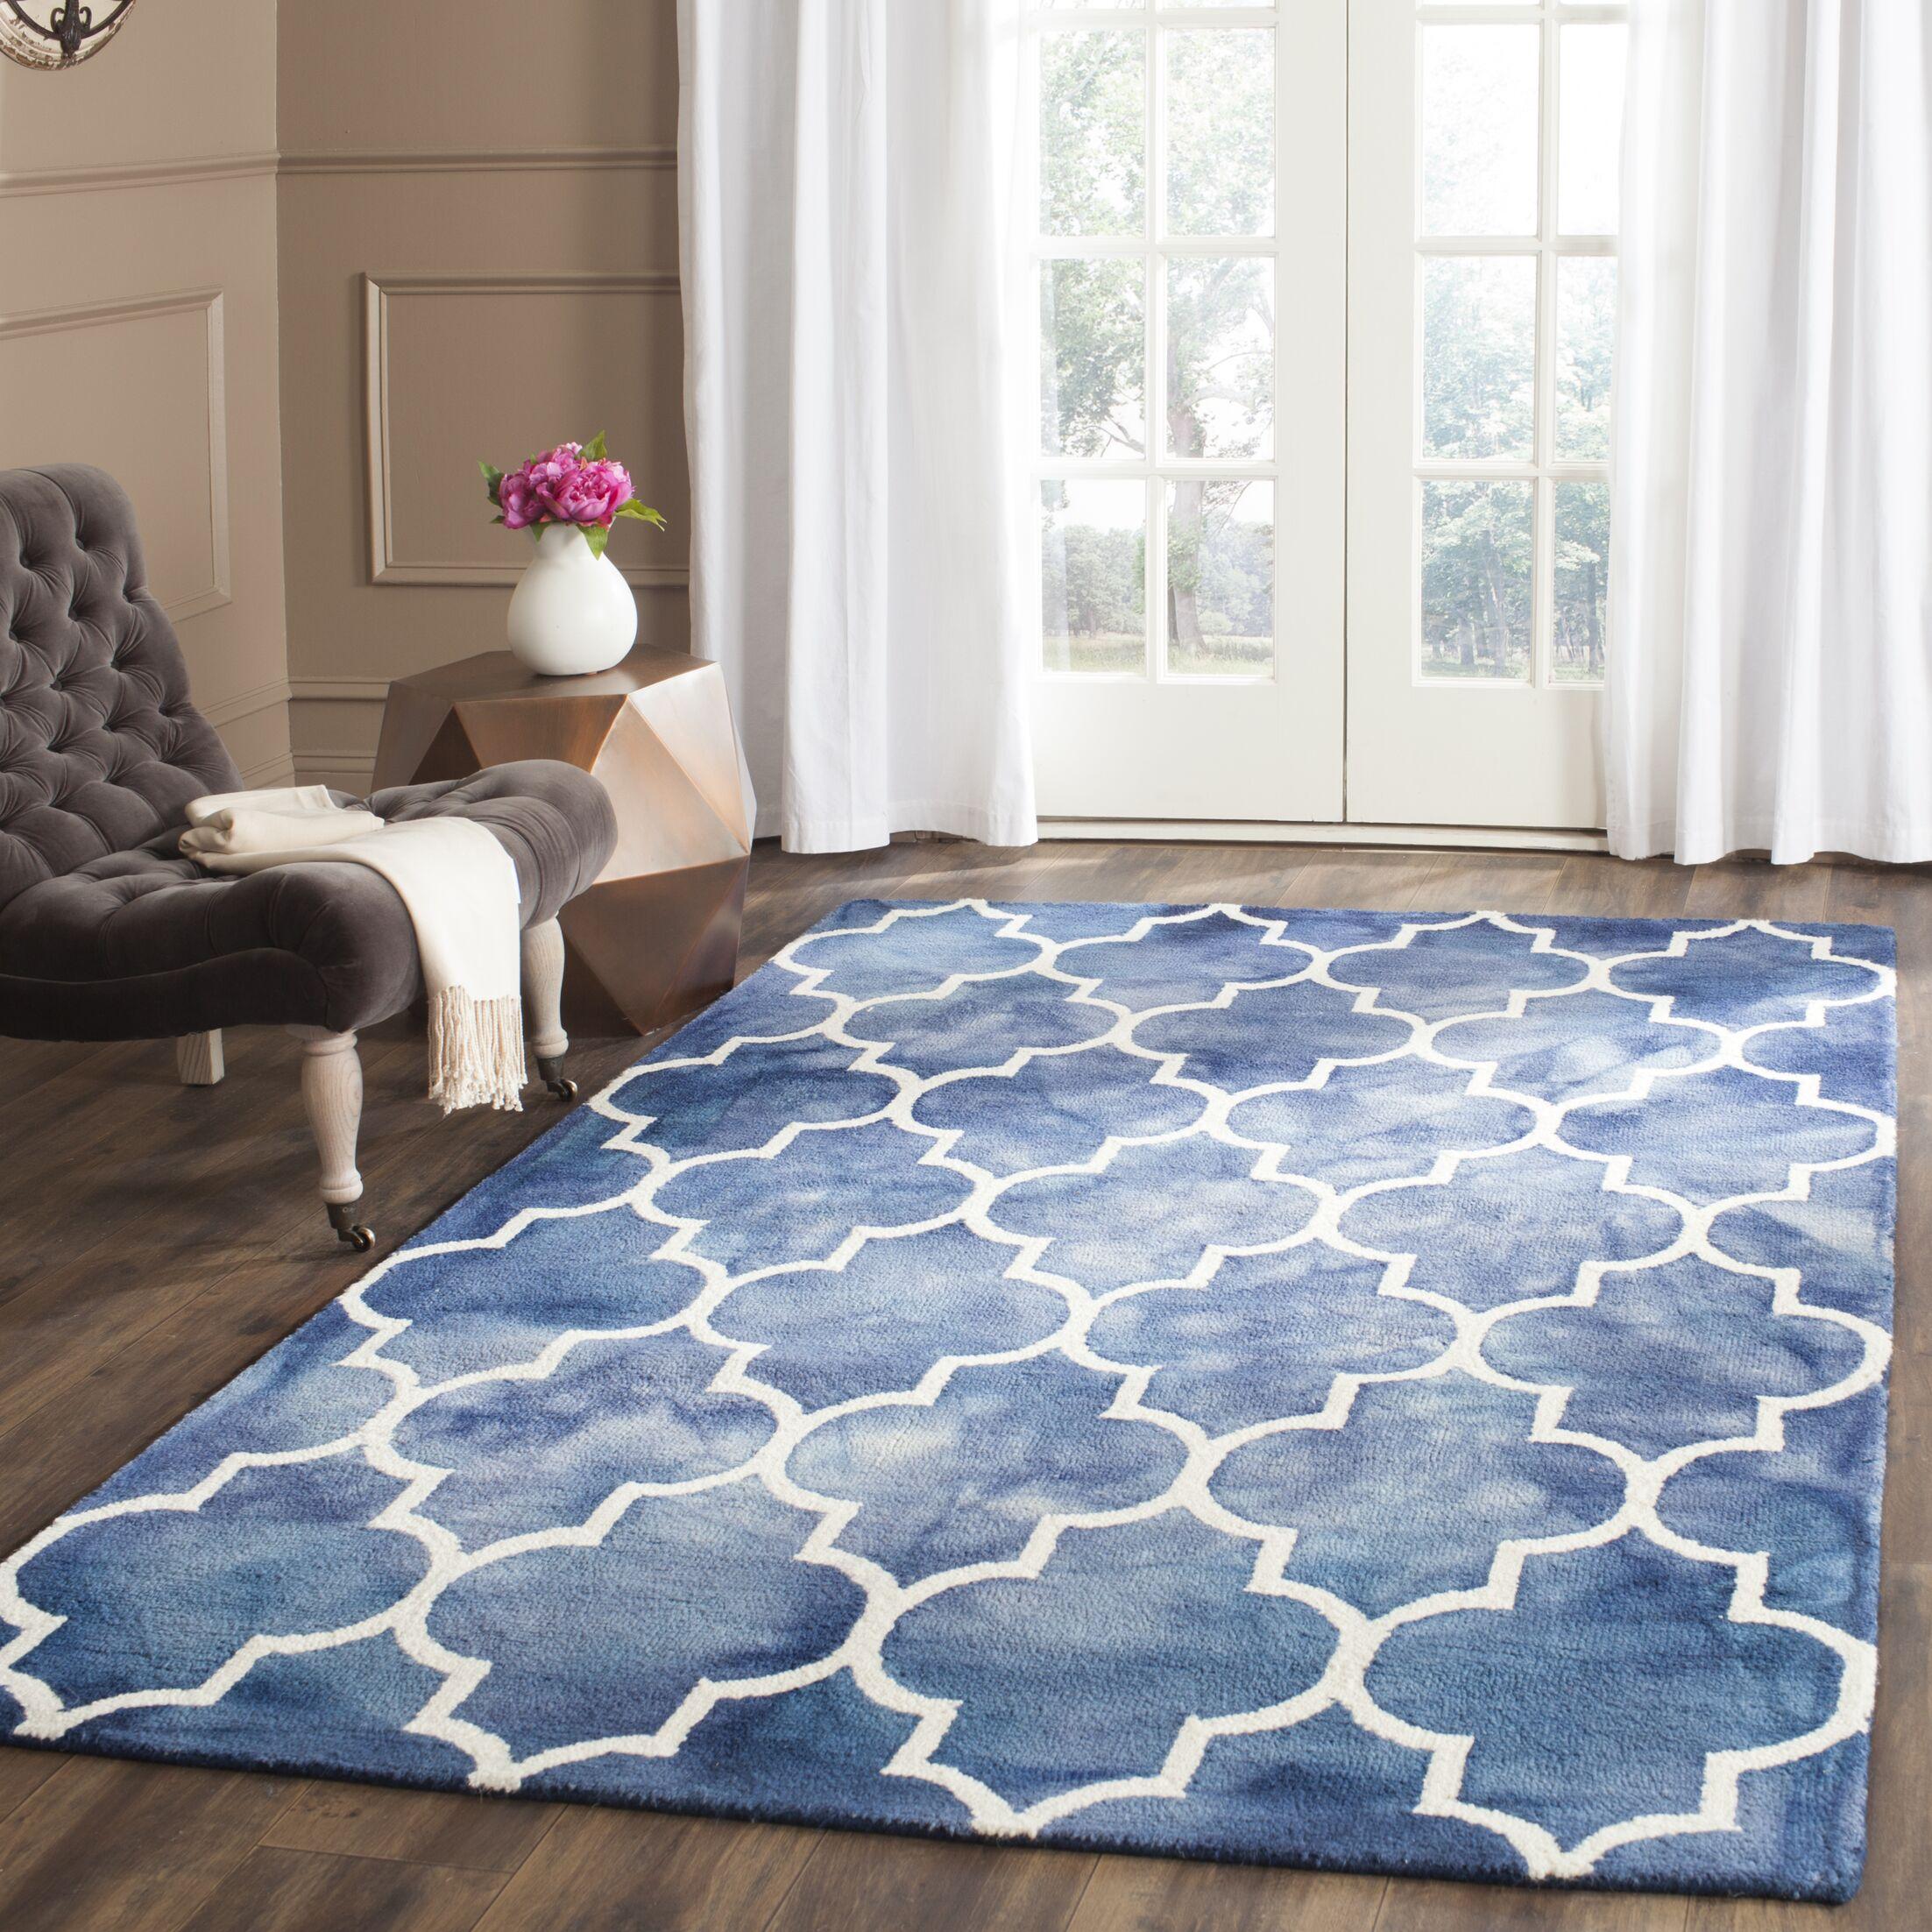 Berman Dip Dye Navy & Ivory Area Rug Rug Size: Rectangle 5' x 8'